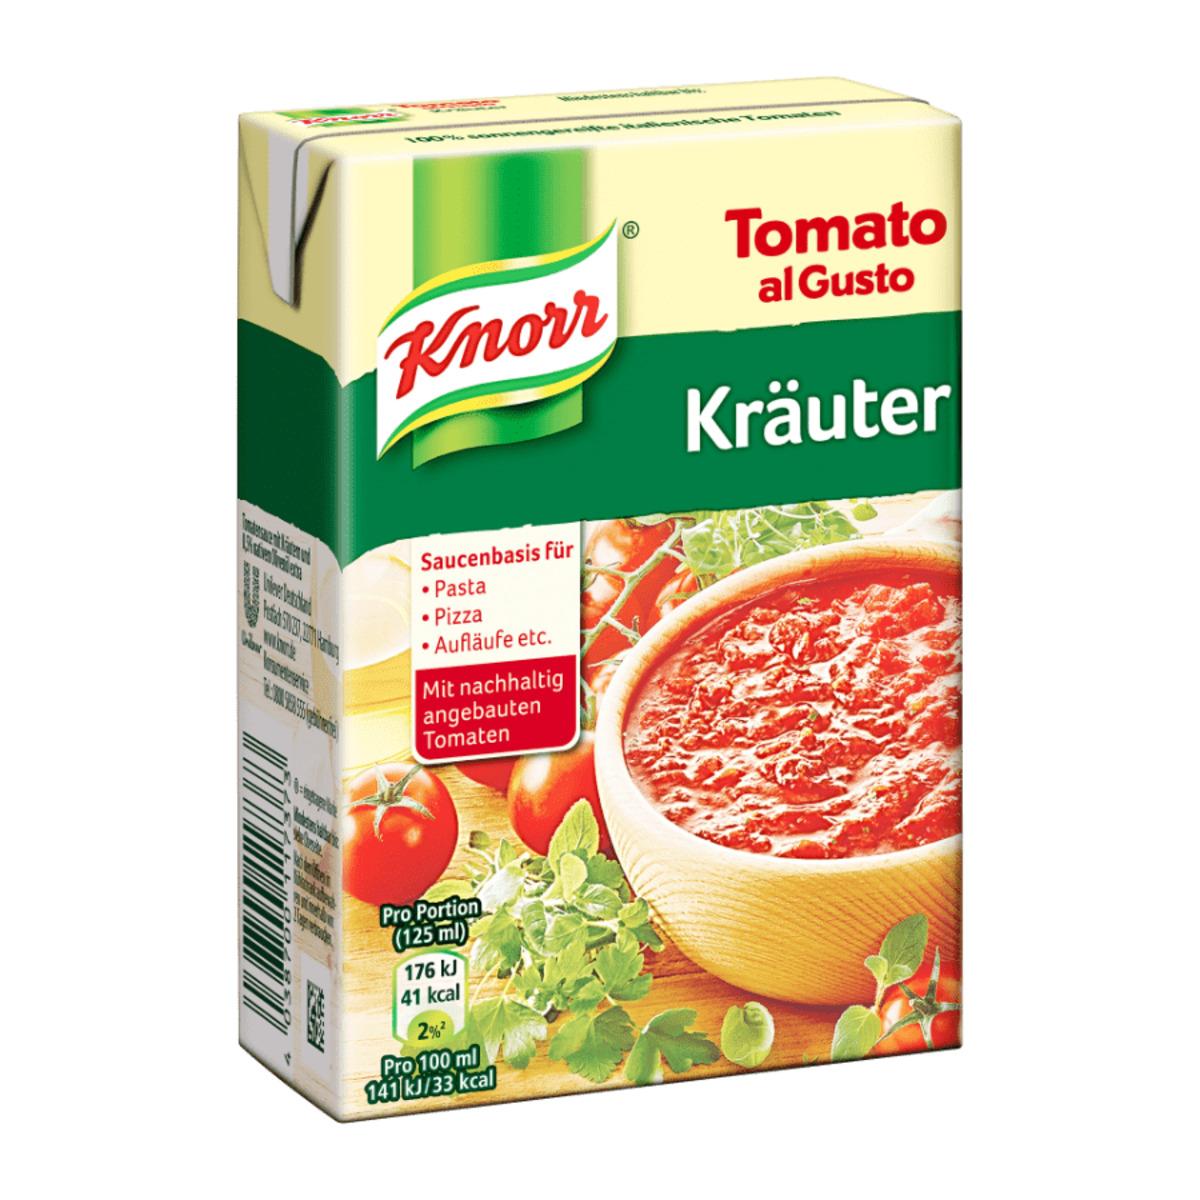 Bild 3 von Knorr Tomato al Gusto